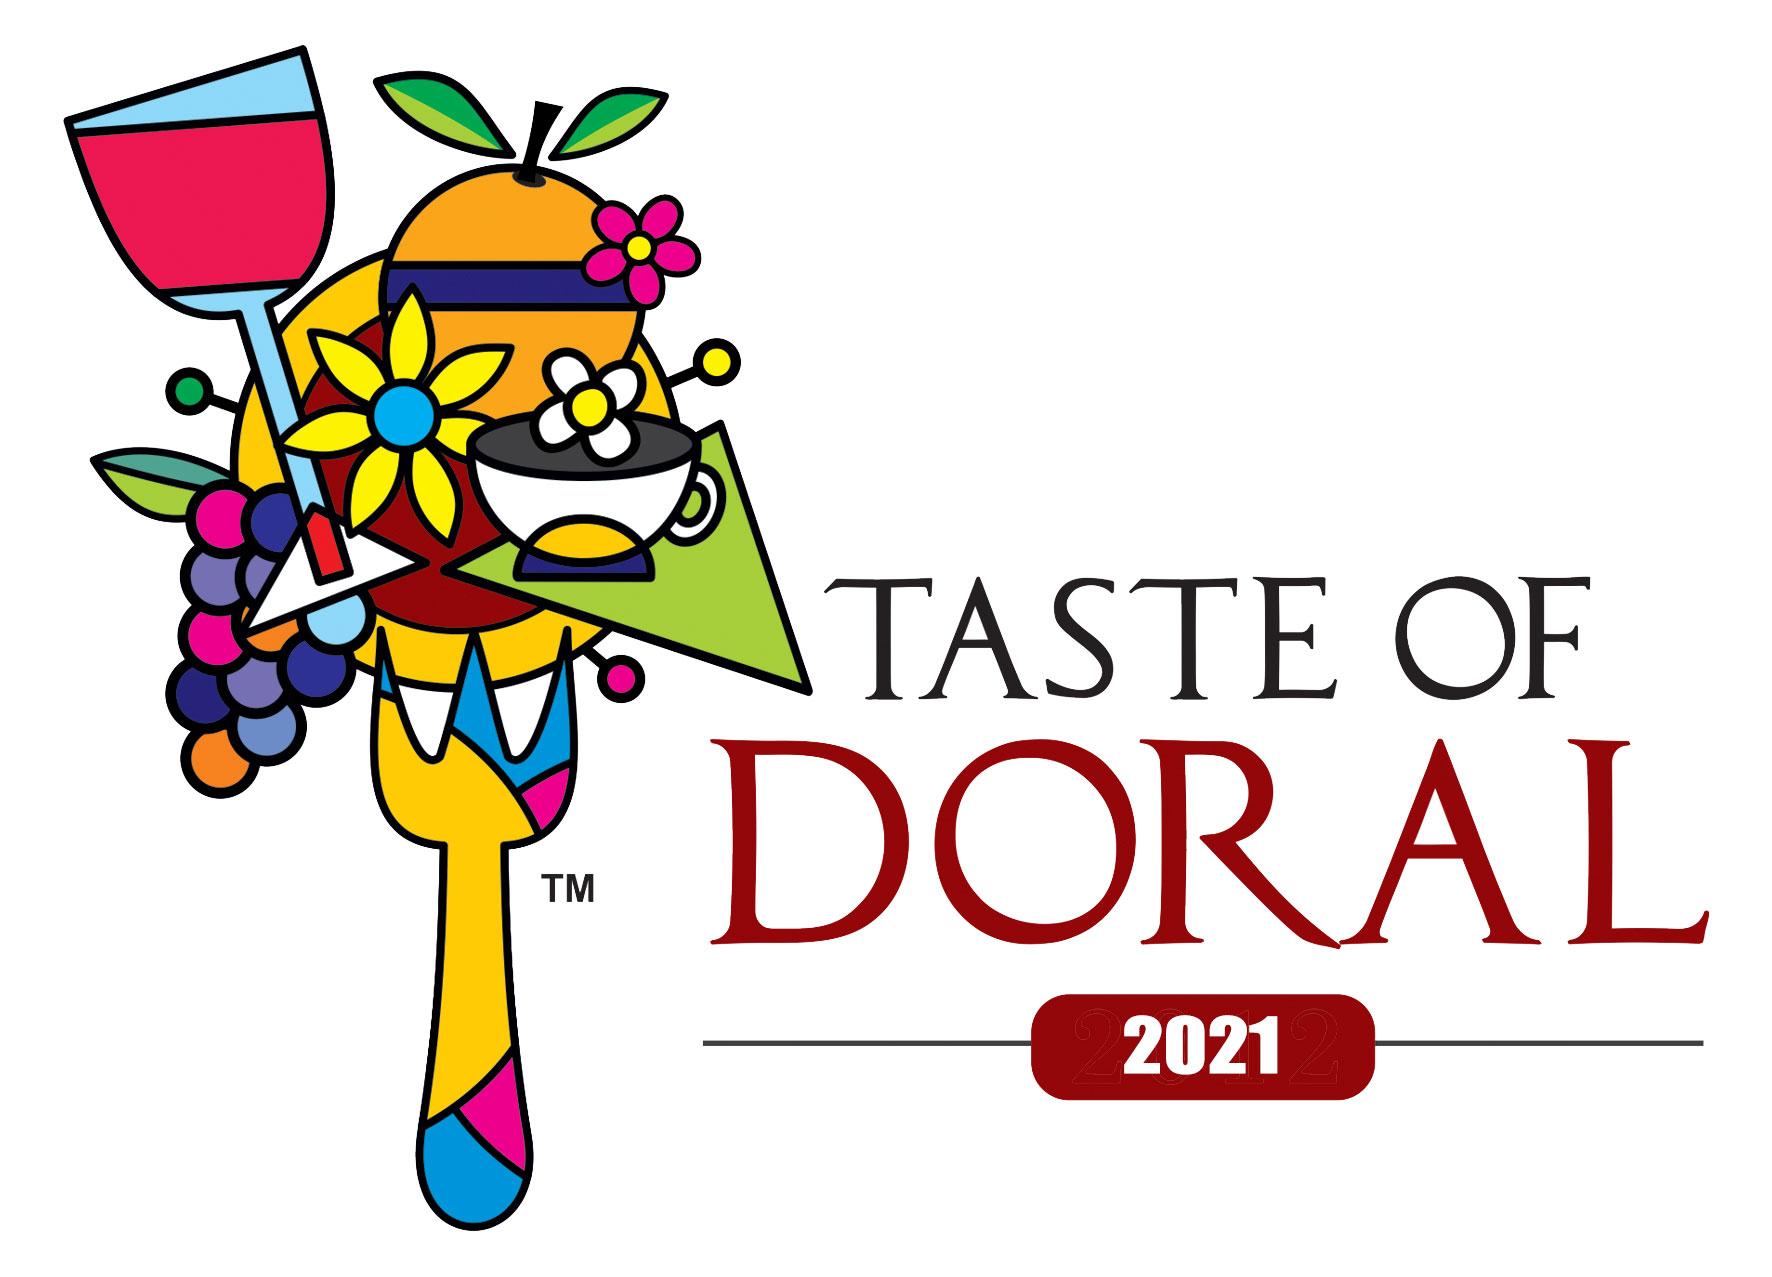 Taste of Doral 2021 - Doral's Finest Restaurants. Doral Chamber of Commerce.